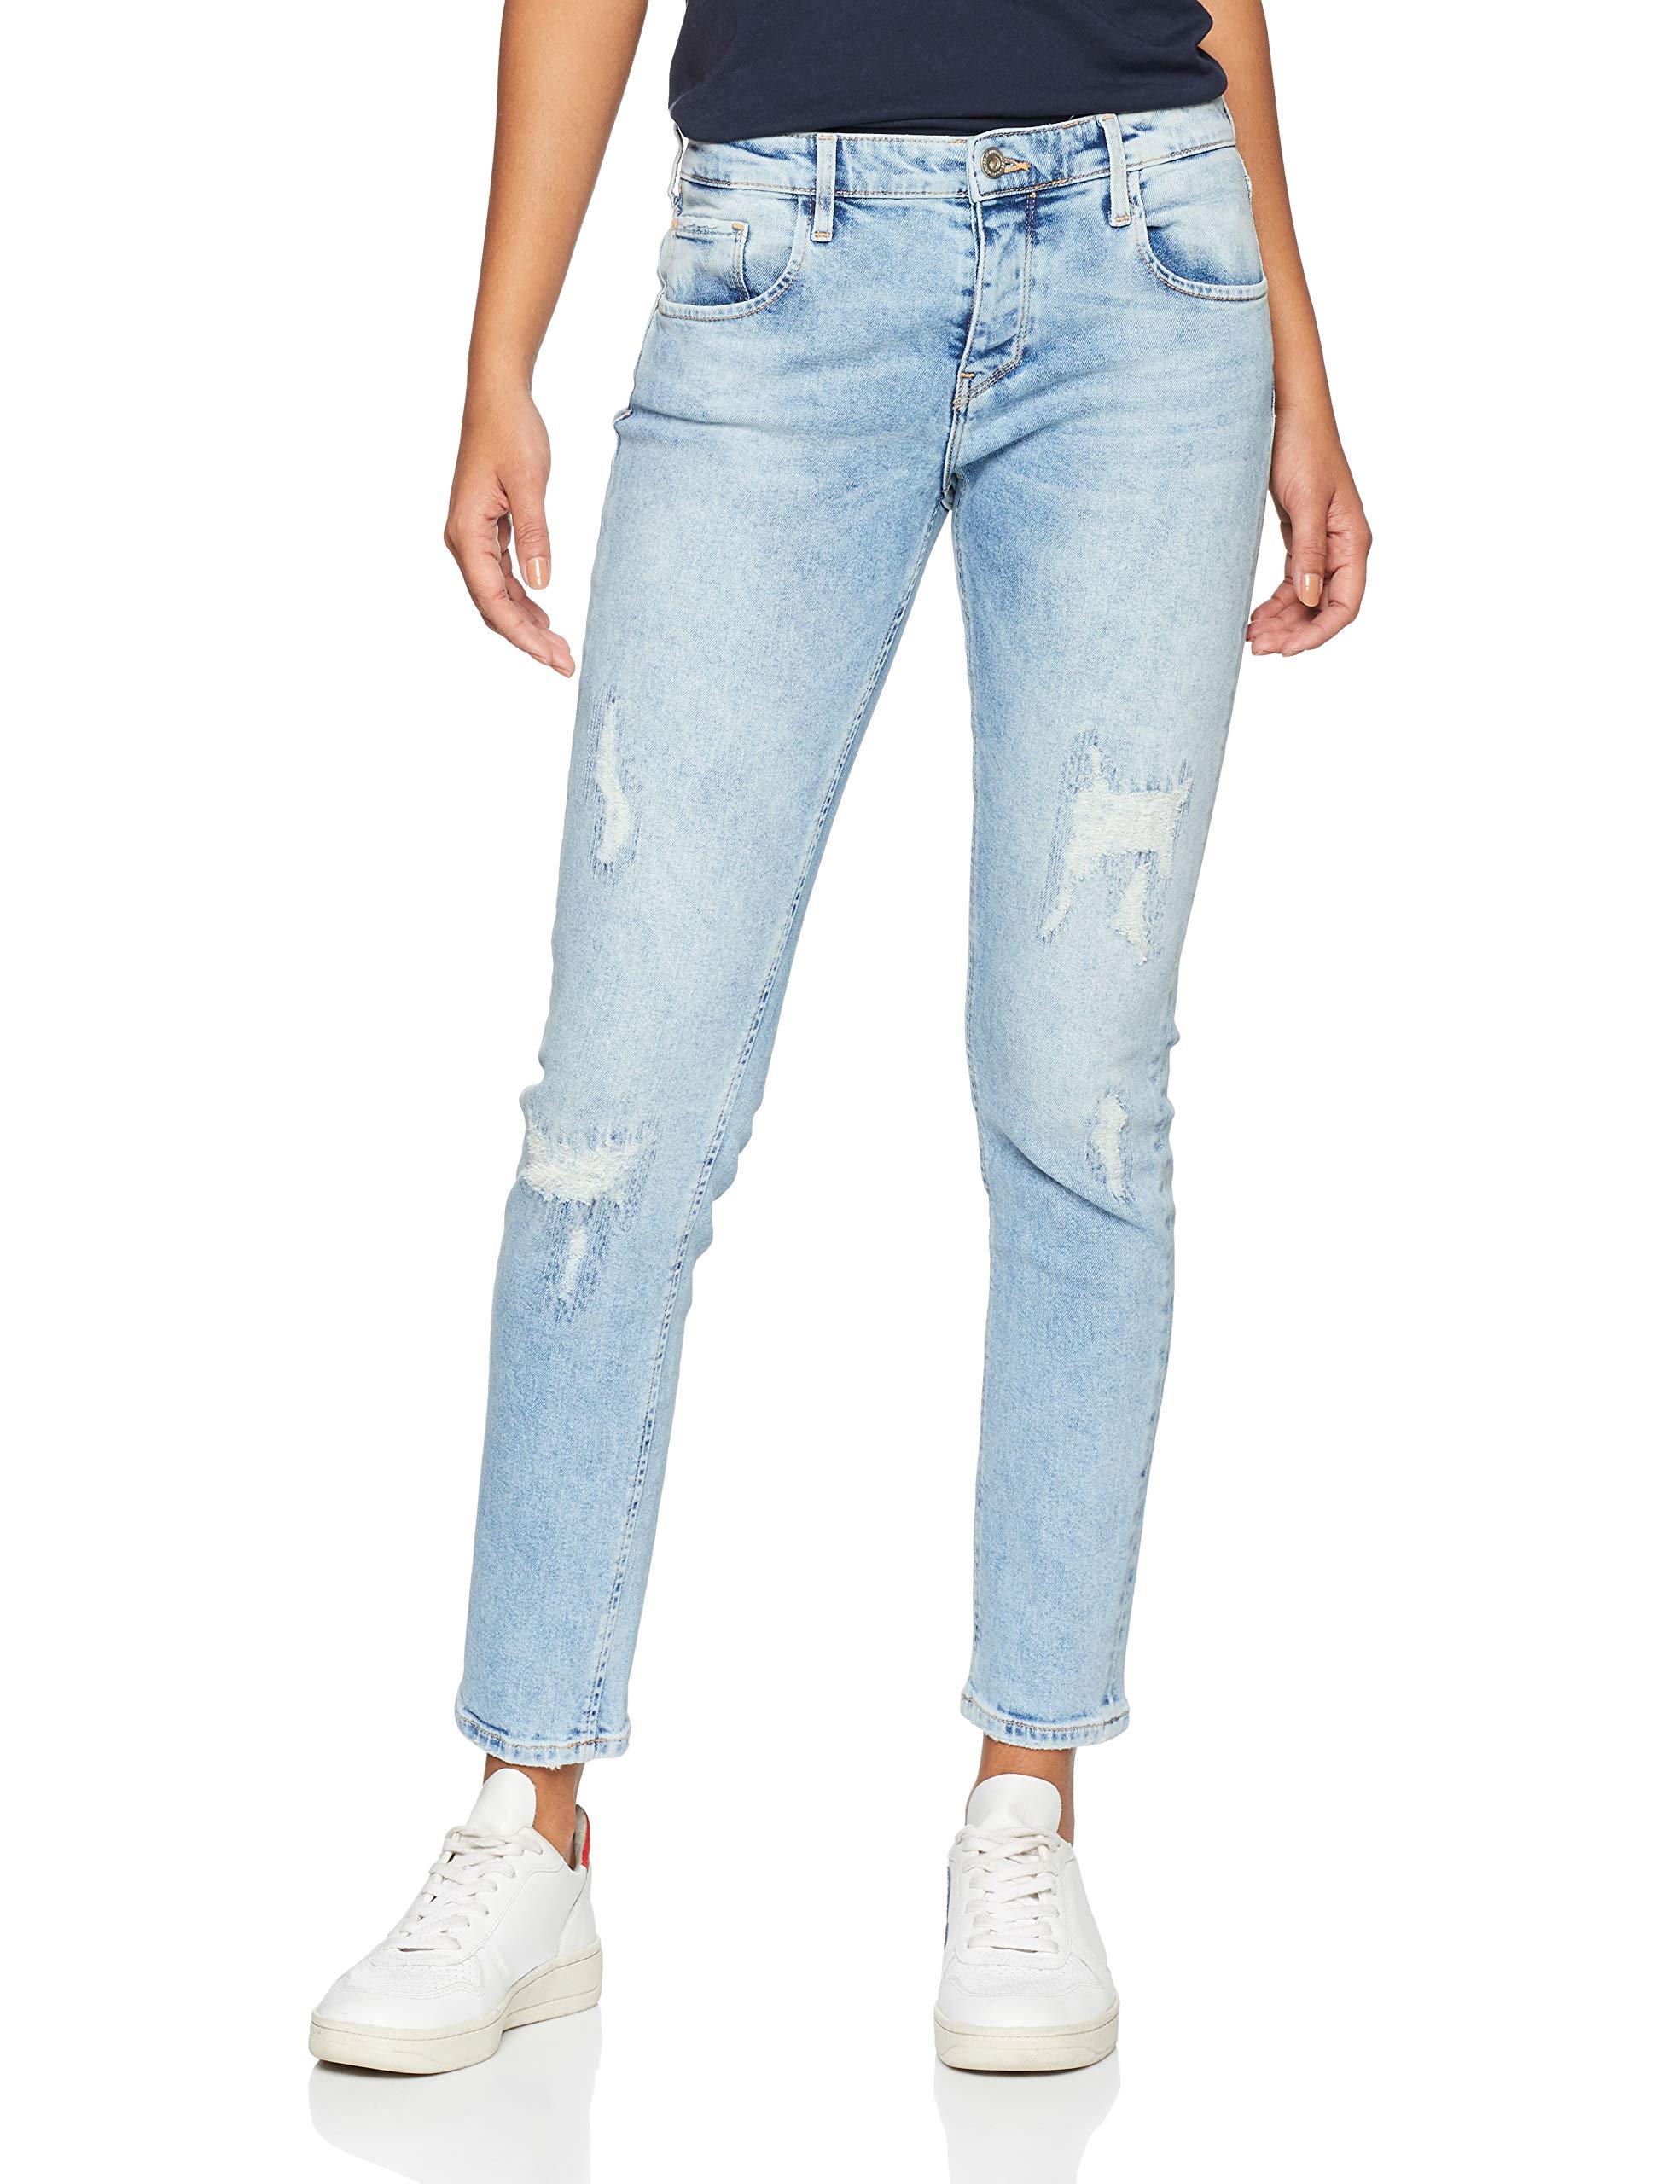 Jean 049W32taille Gwen Destroyed Fabricant32Femme Blue Cross BoyfriendBleulight Jeans GVSqzpUM